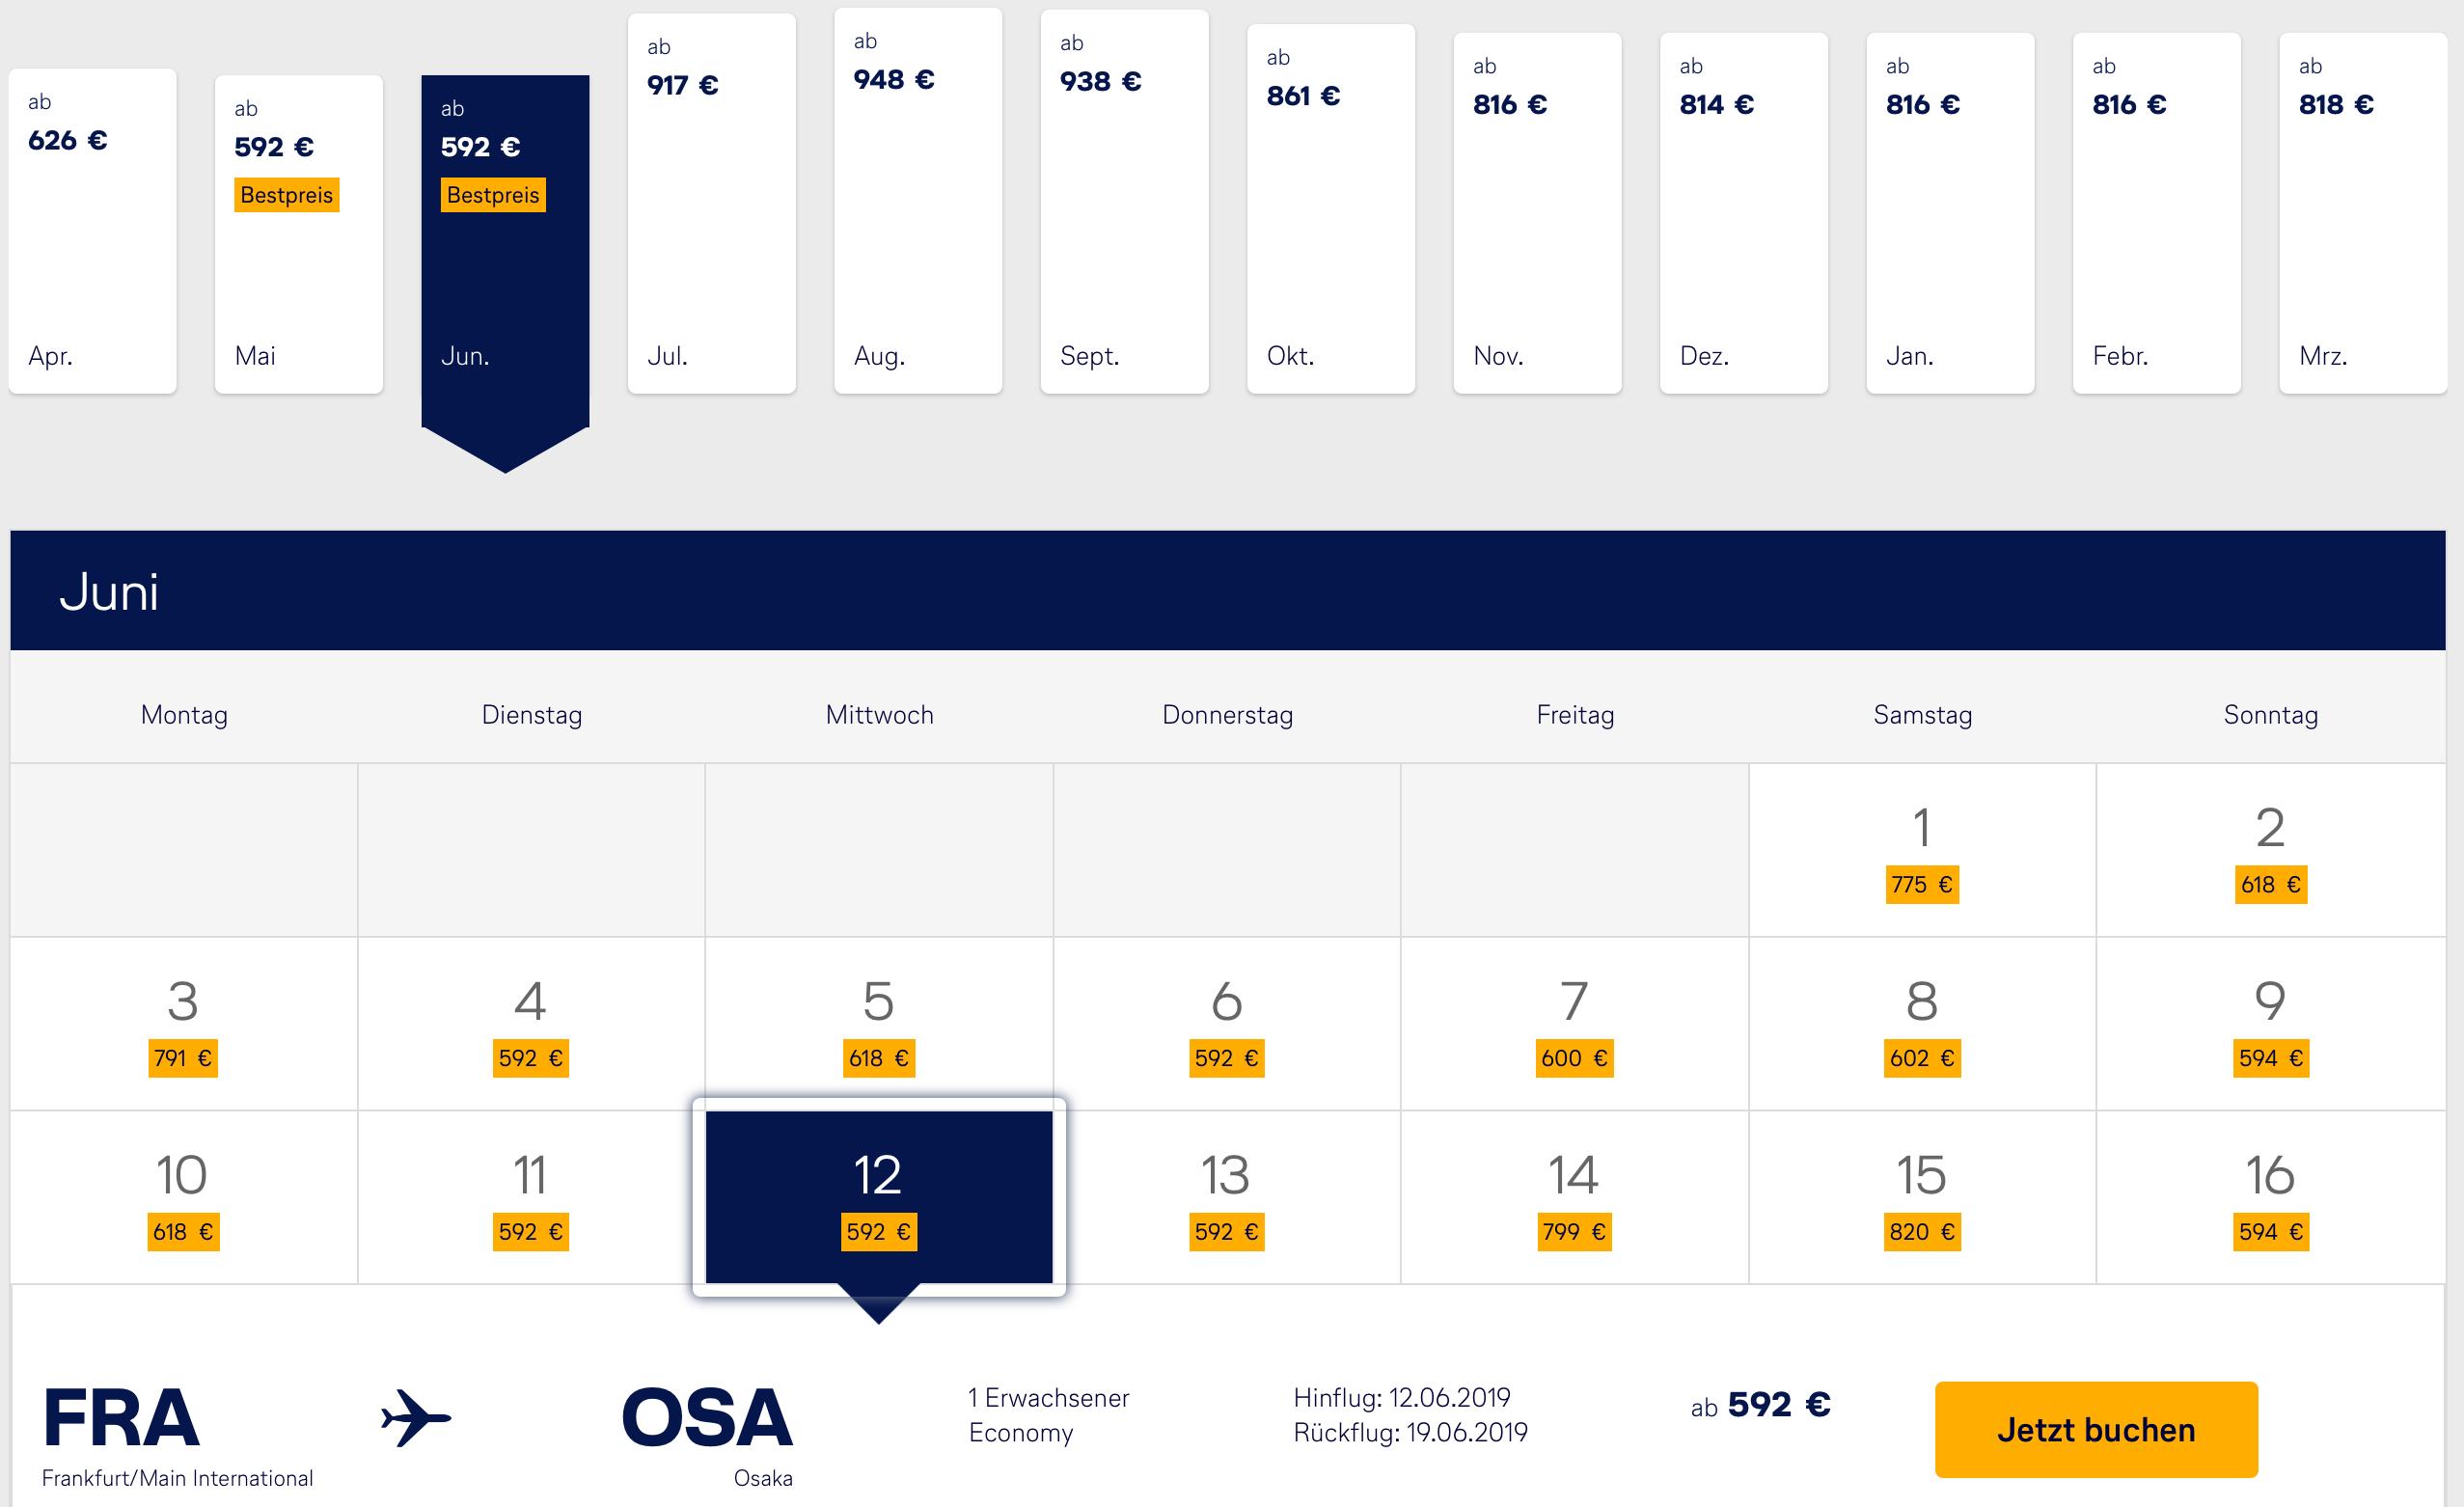 Lufthansa Osaka Economy Class